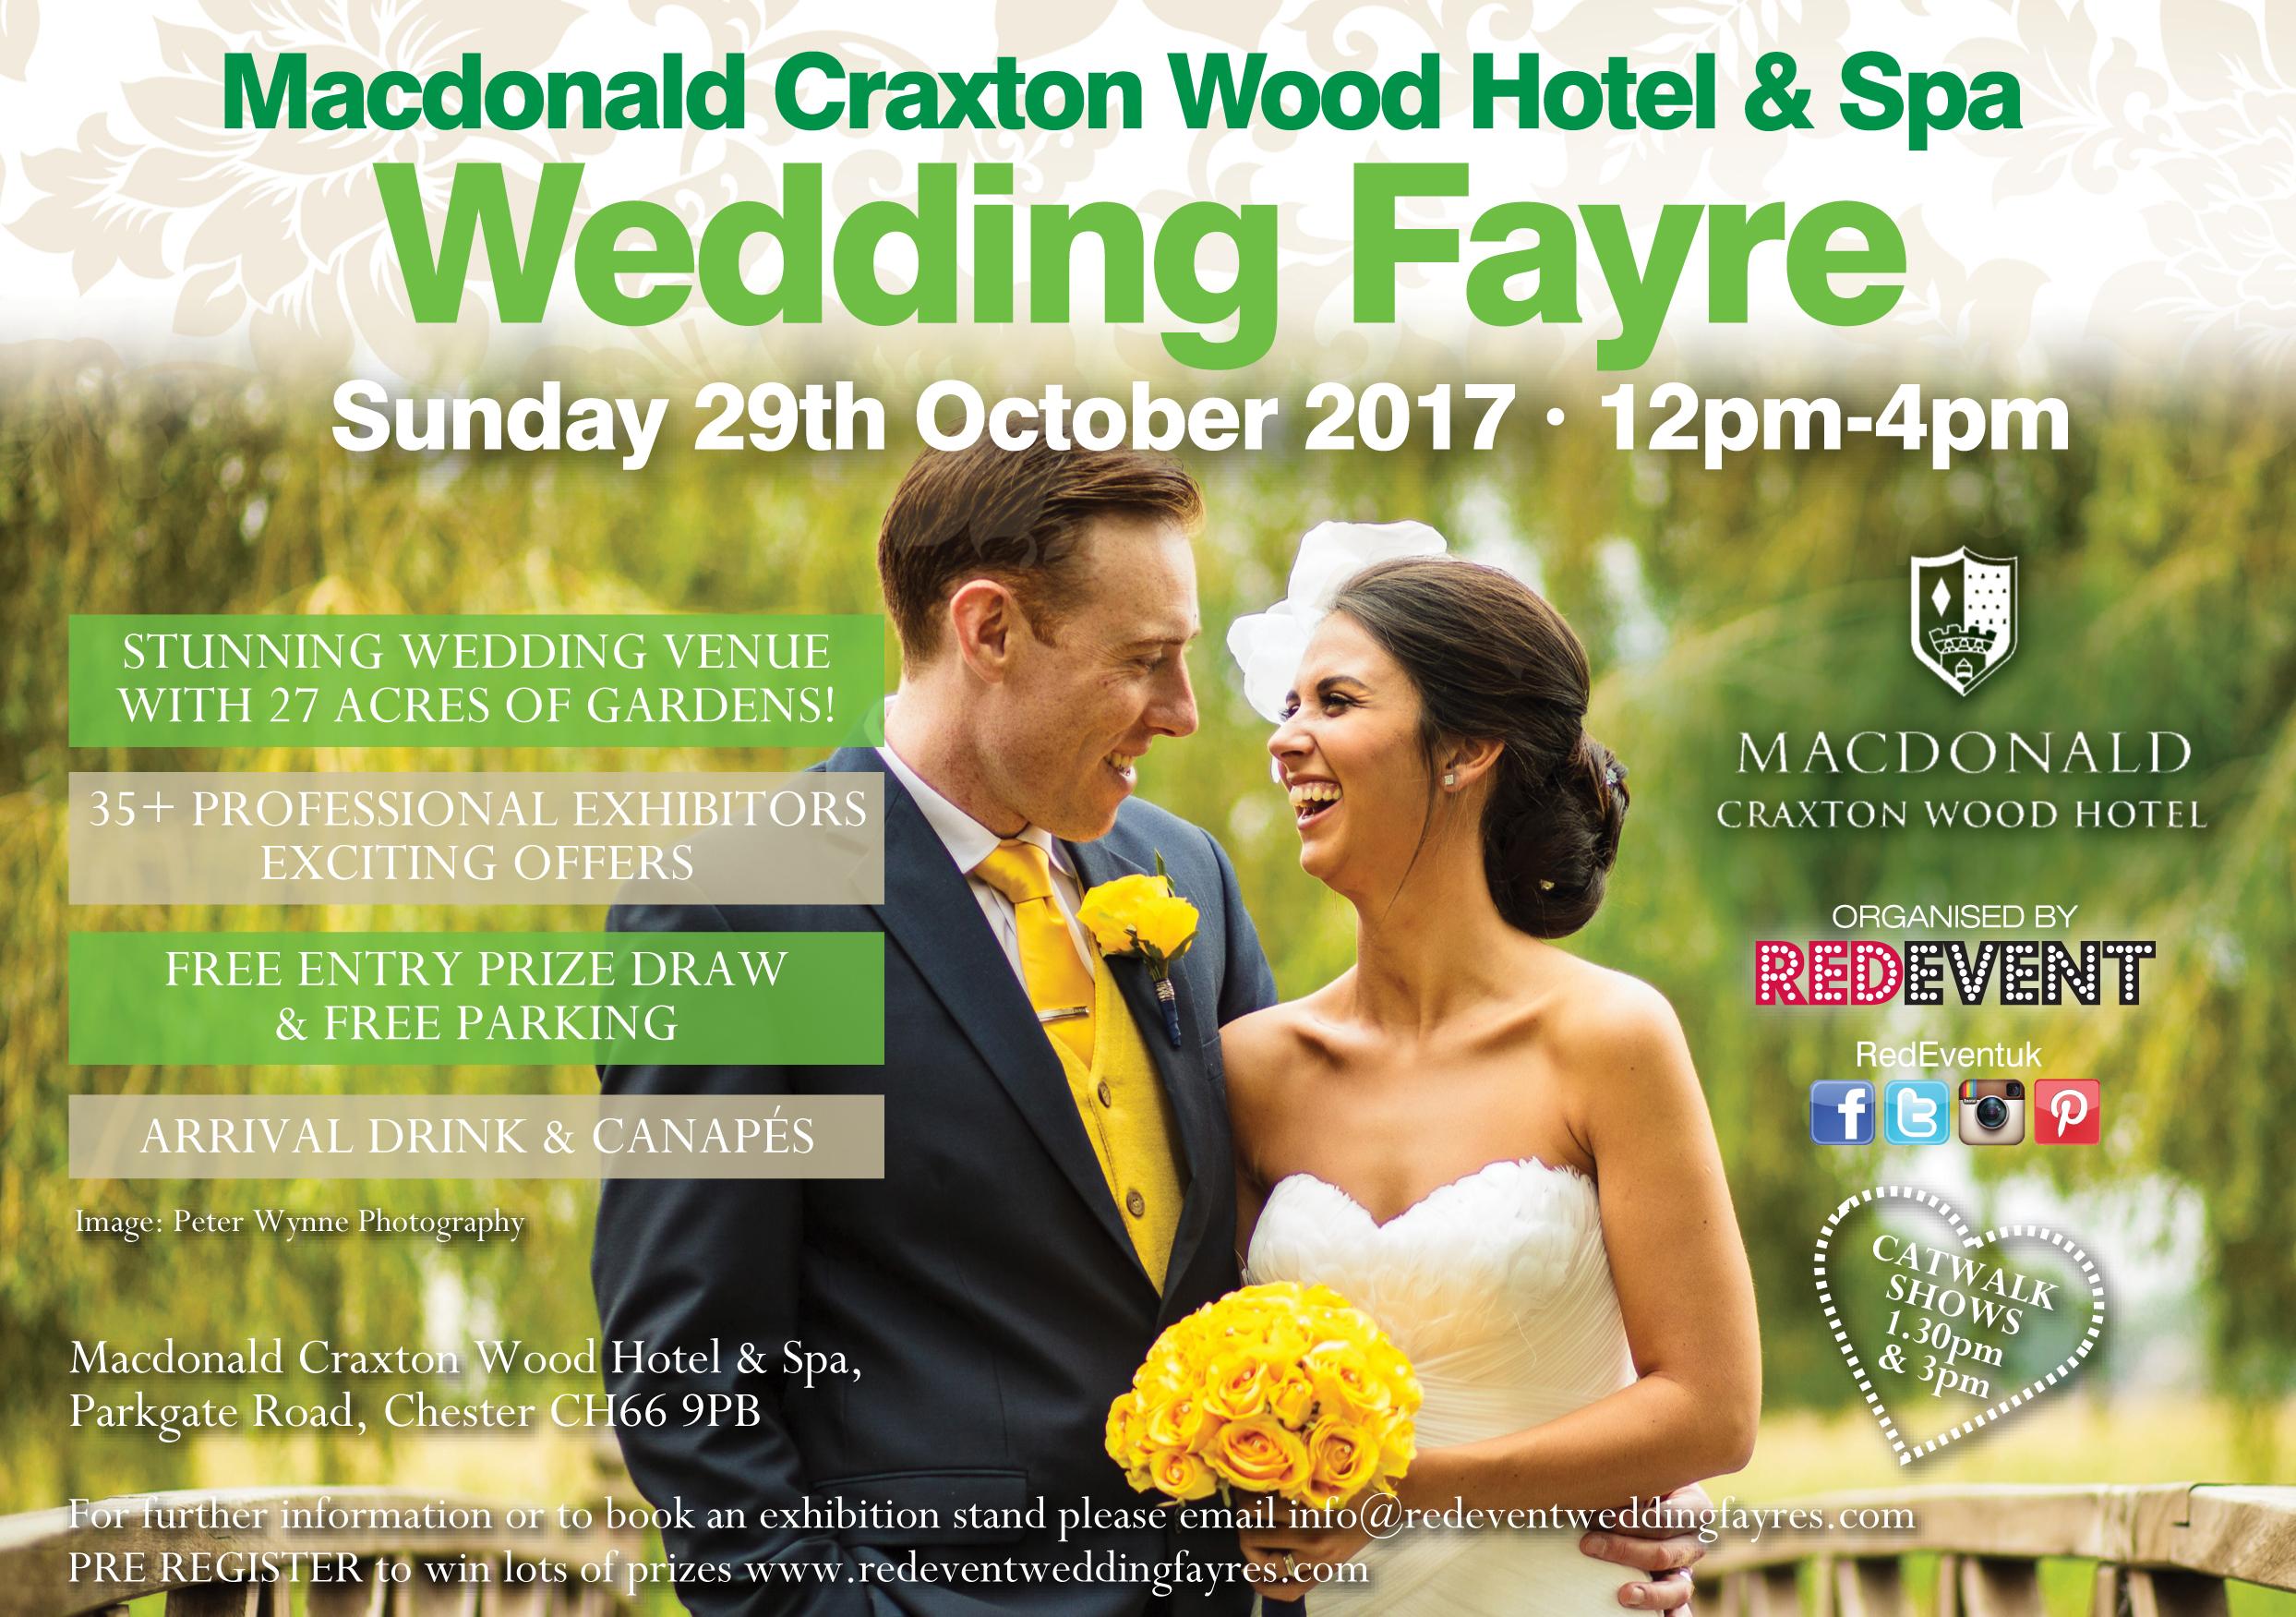 Macdonald Craxton Wood Chester Wedding Fayre Red Event.jpg